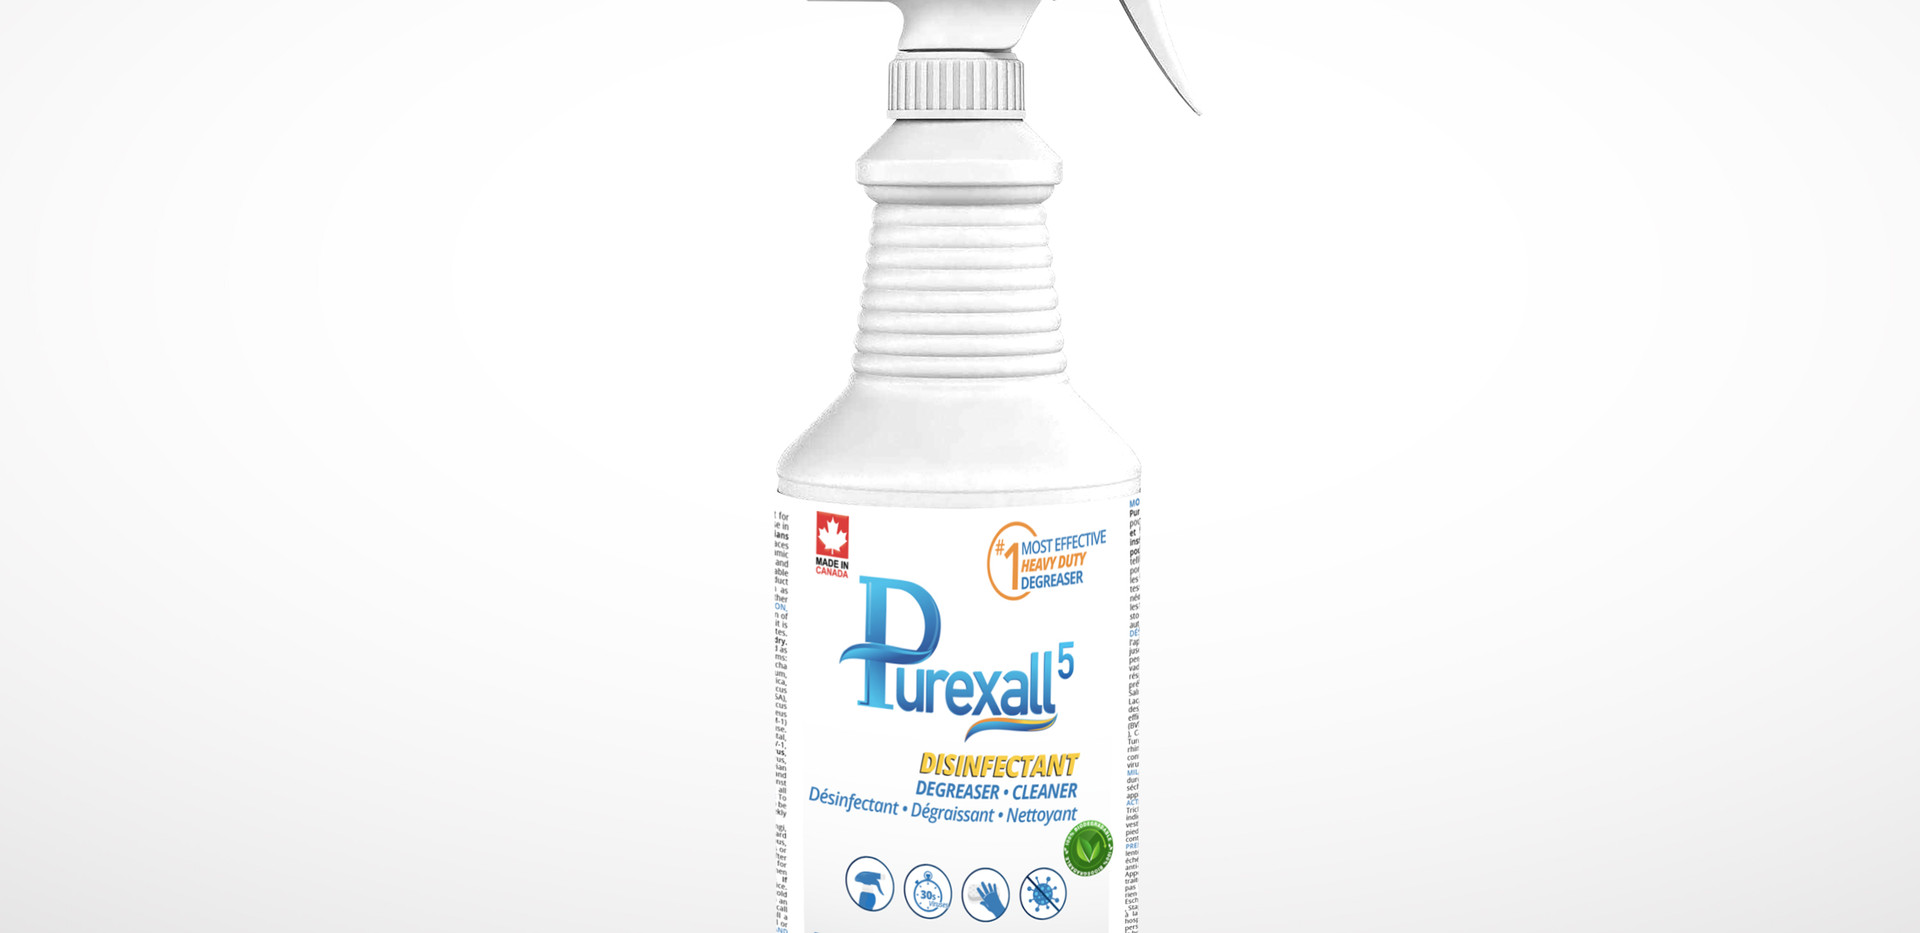 Purexall 5 1L Spray Bottle.jpg